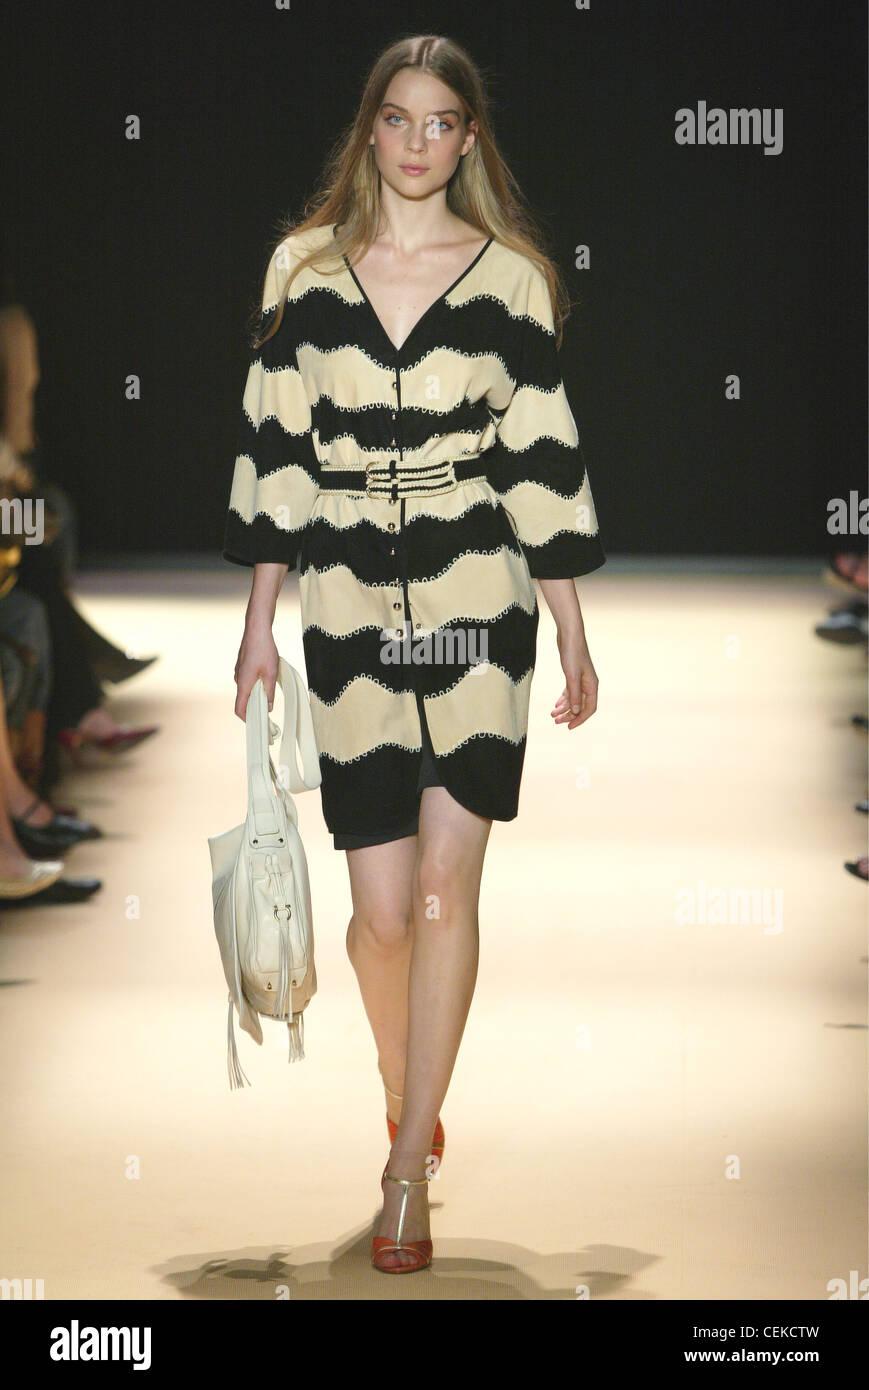 95e03efe002 Salvatore Ferragamo Milan Ready to Wear S S Model wearing black and ...